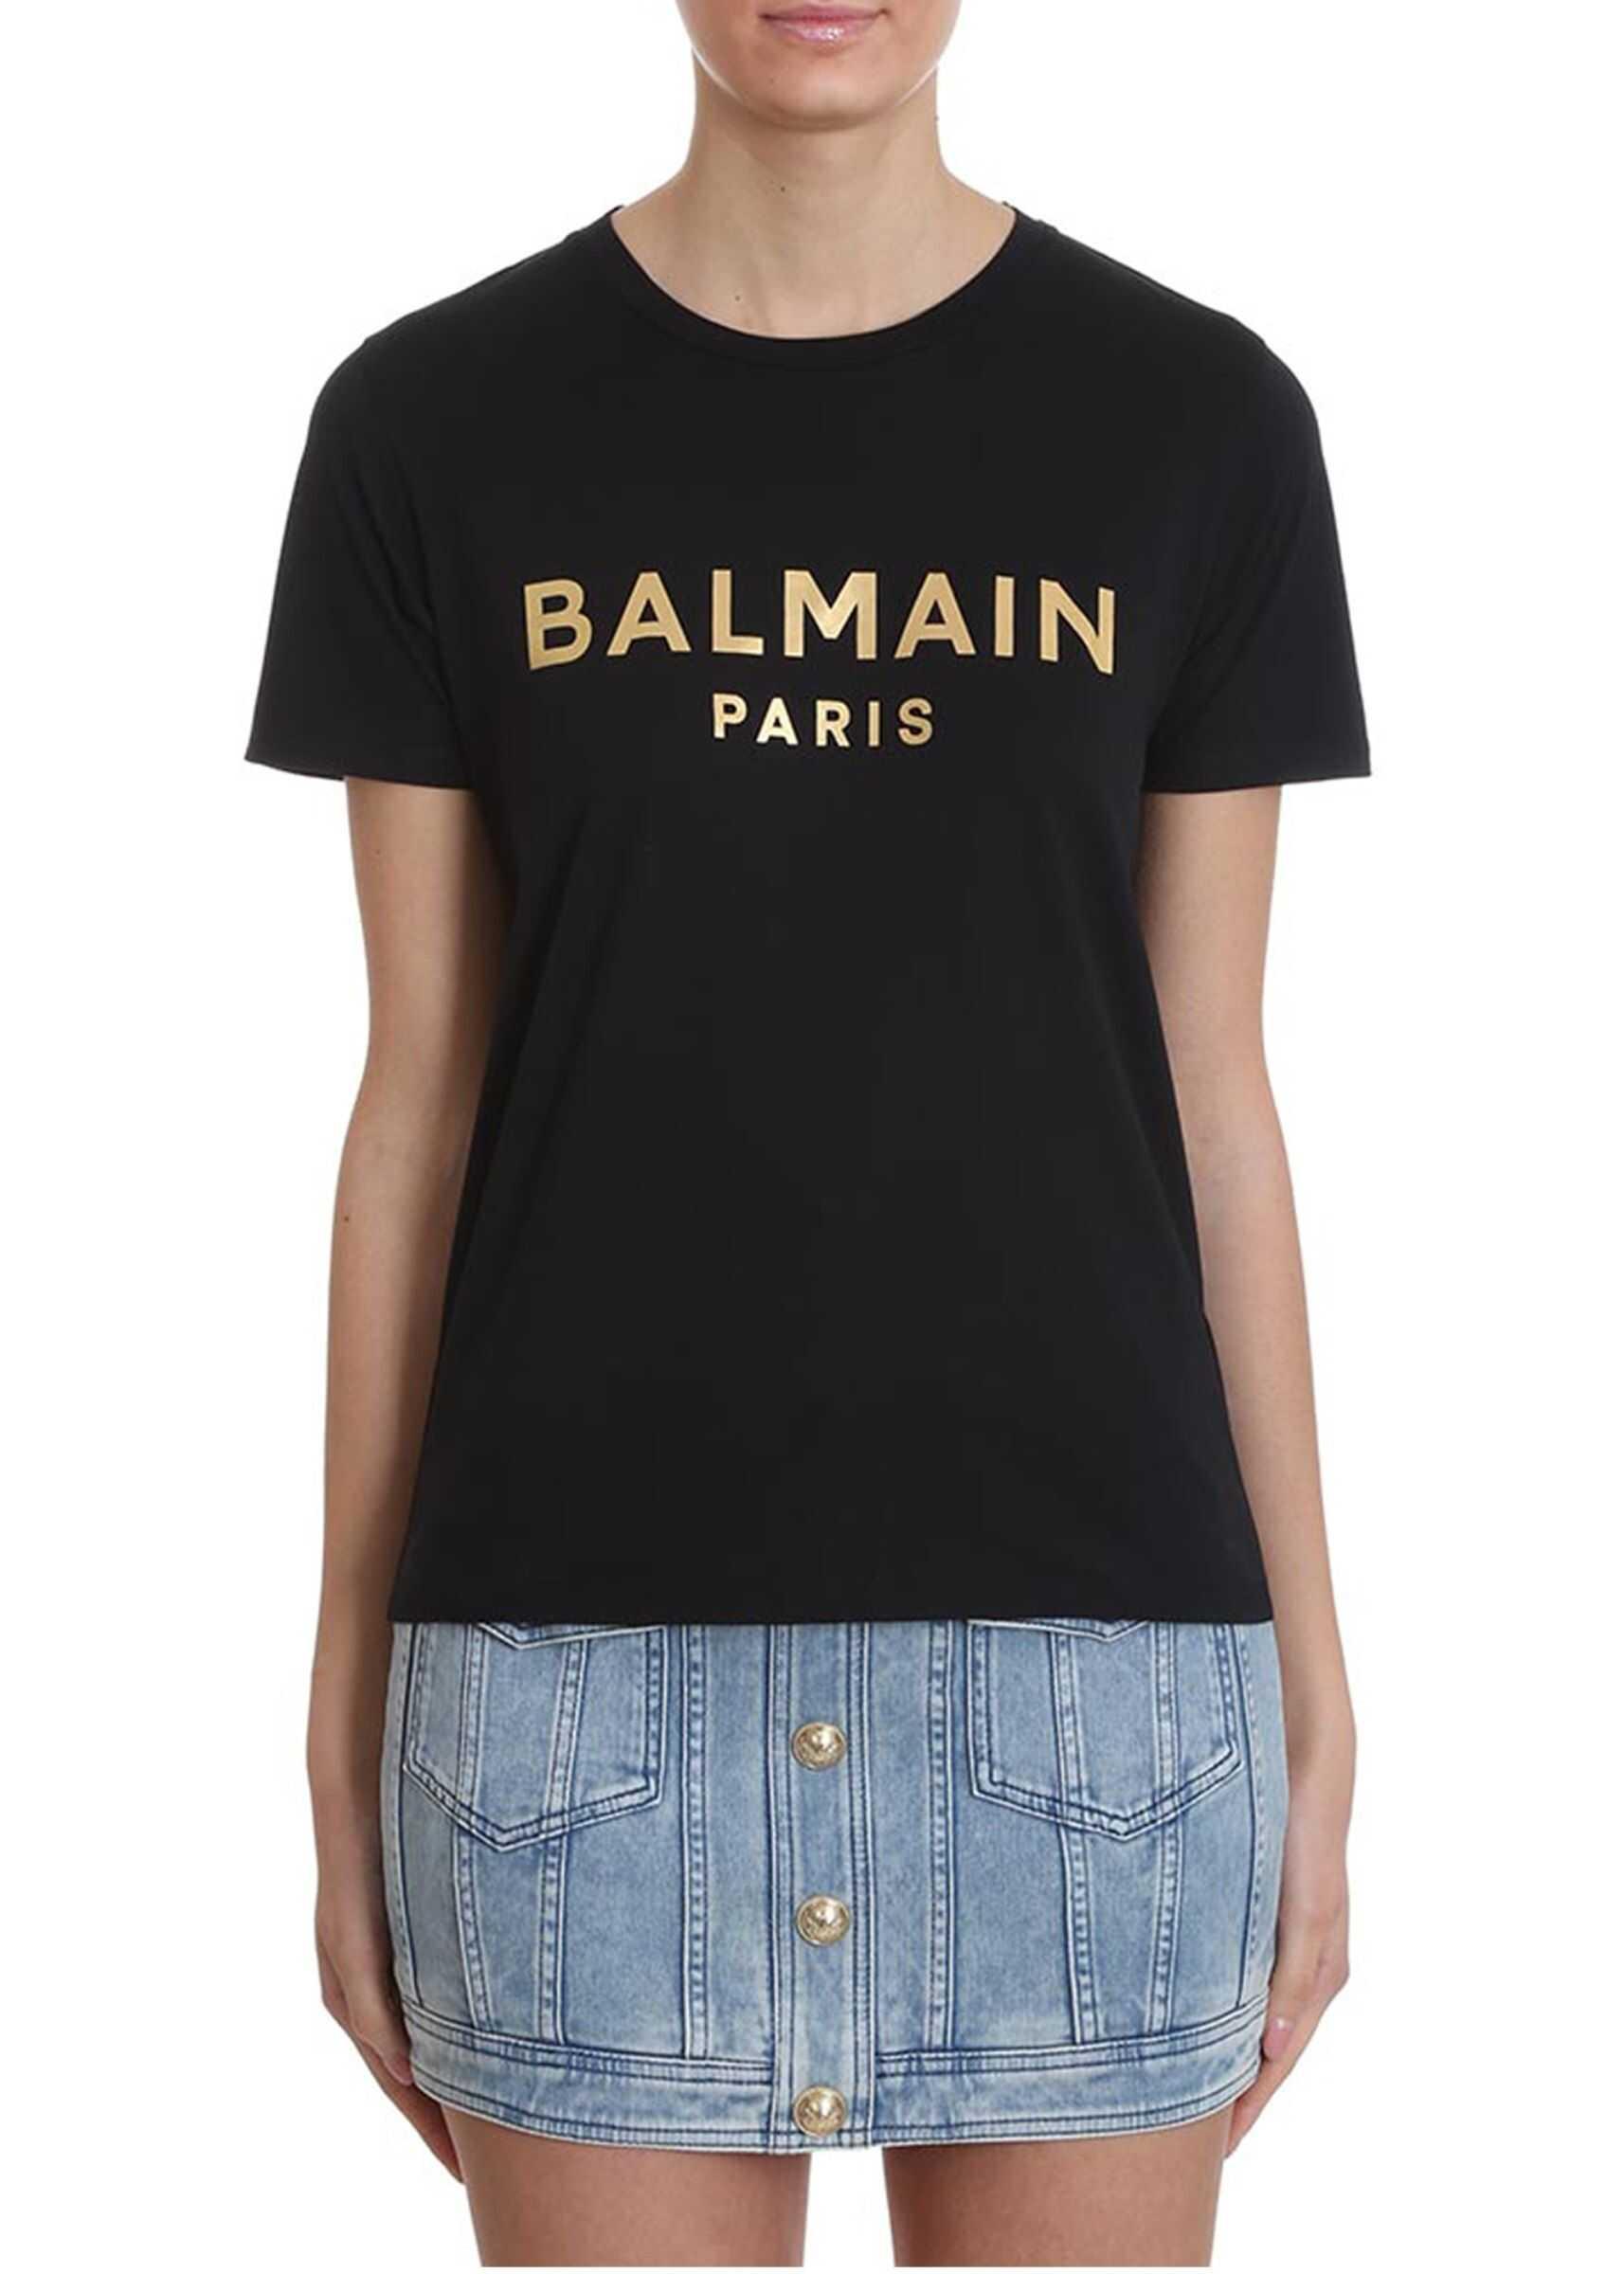 Balmain Round Neck T-Shirt BLACK